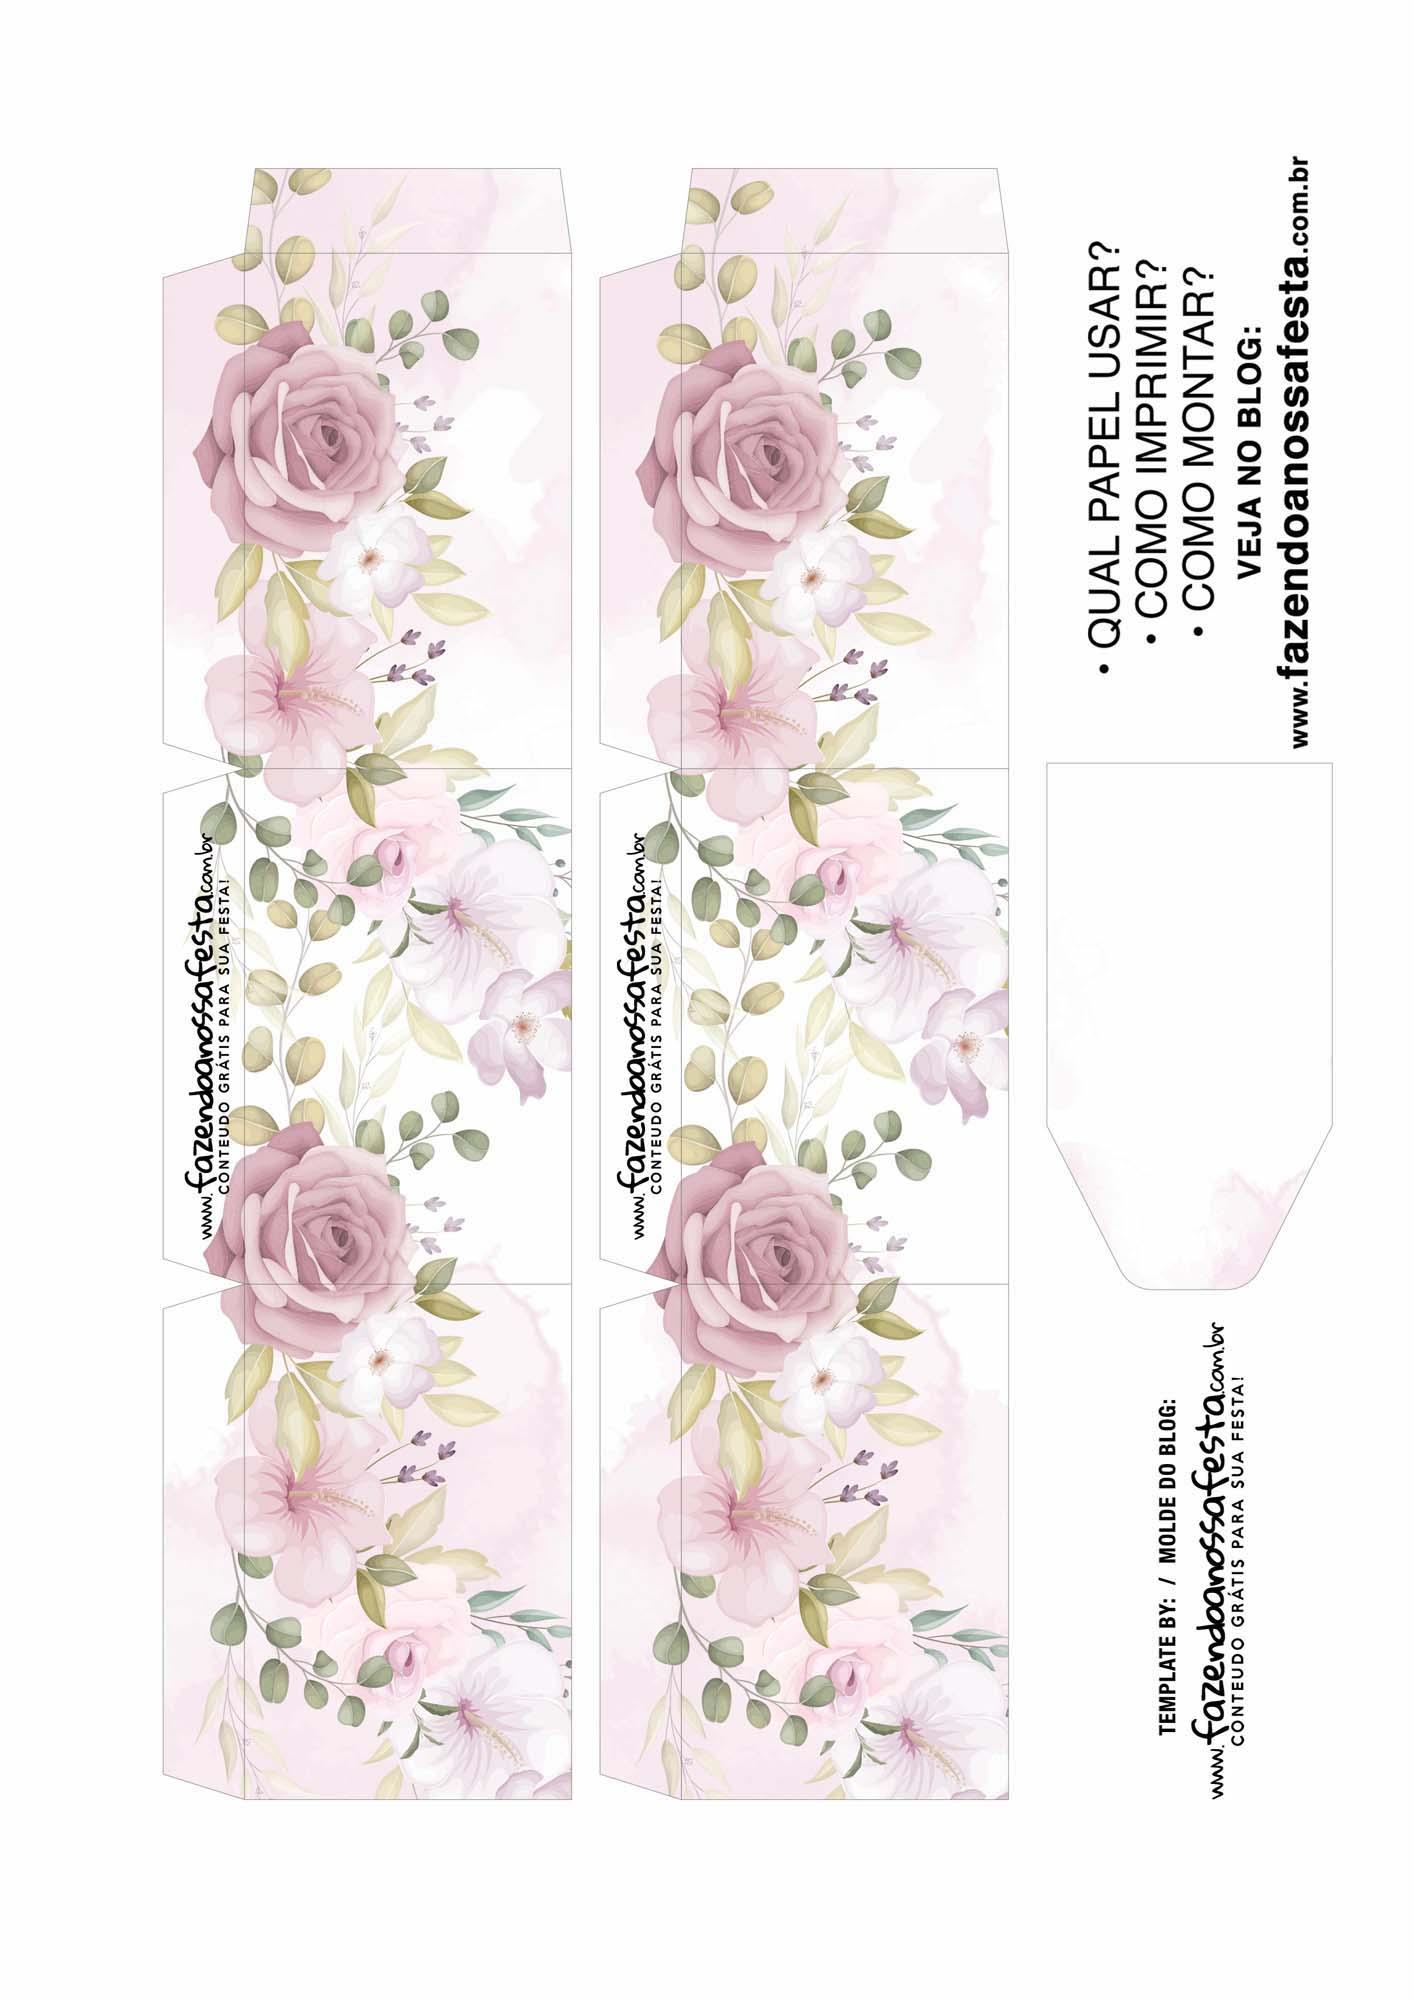 Caixa Explosiva Dia das Maes Floral Rosa Aquarela 2